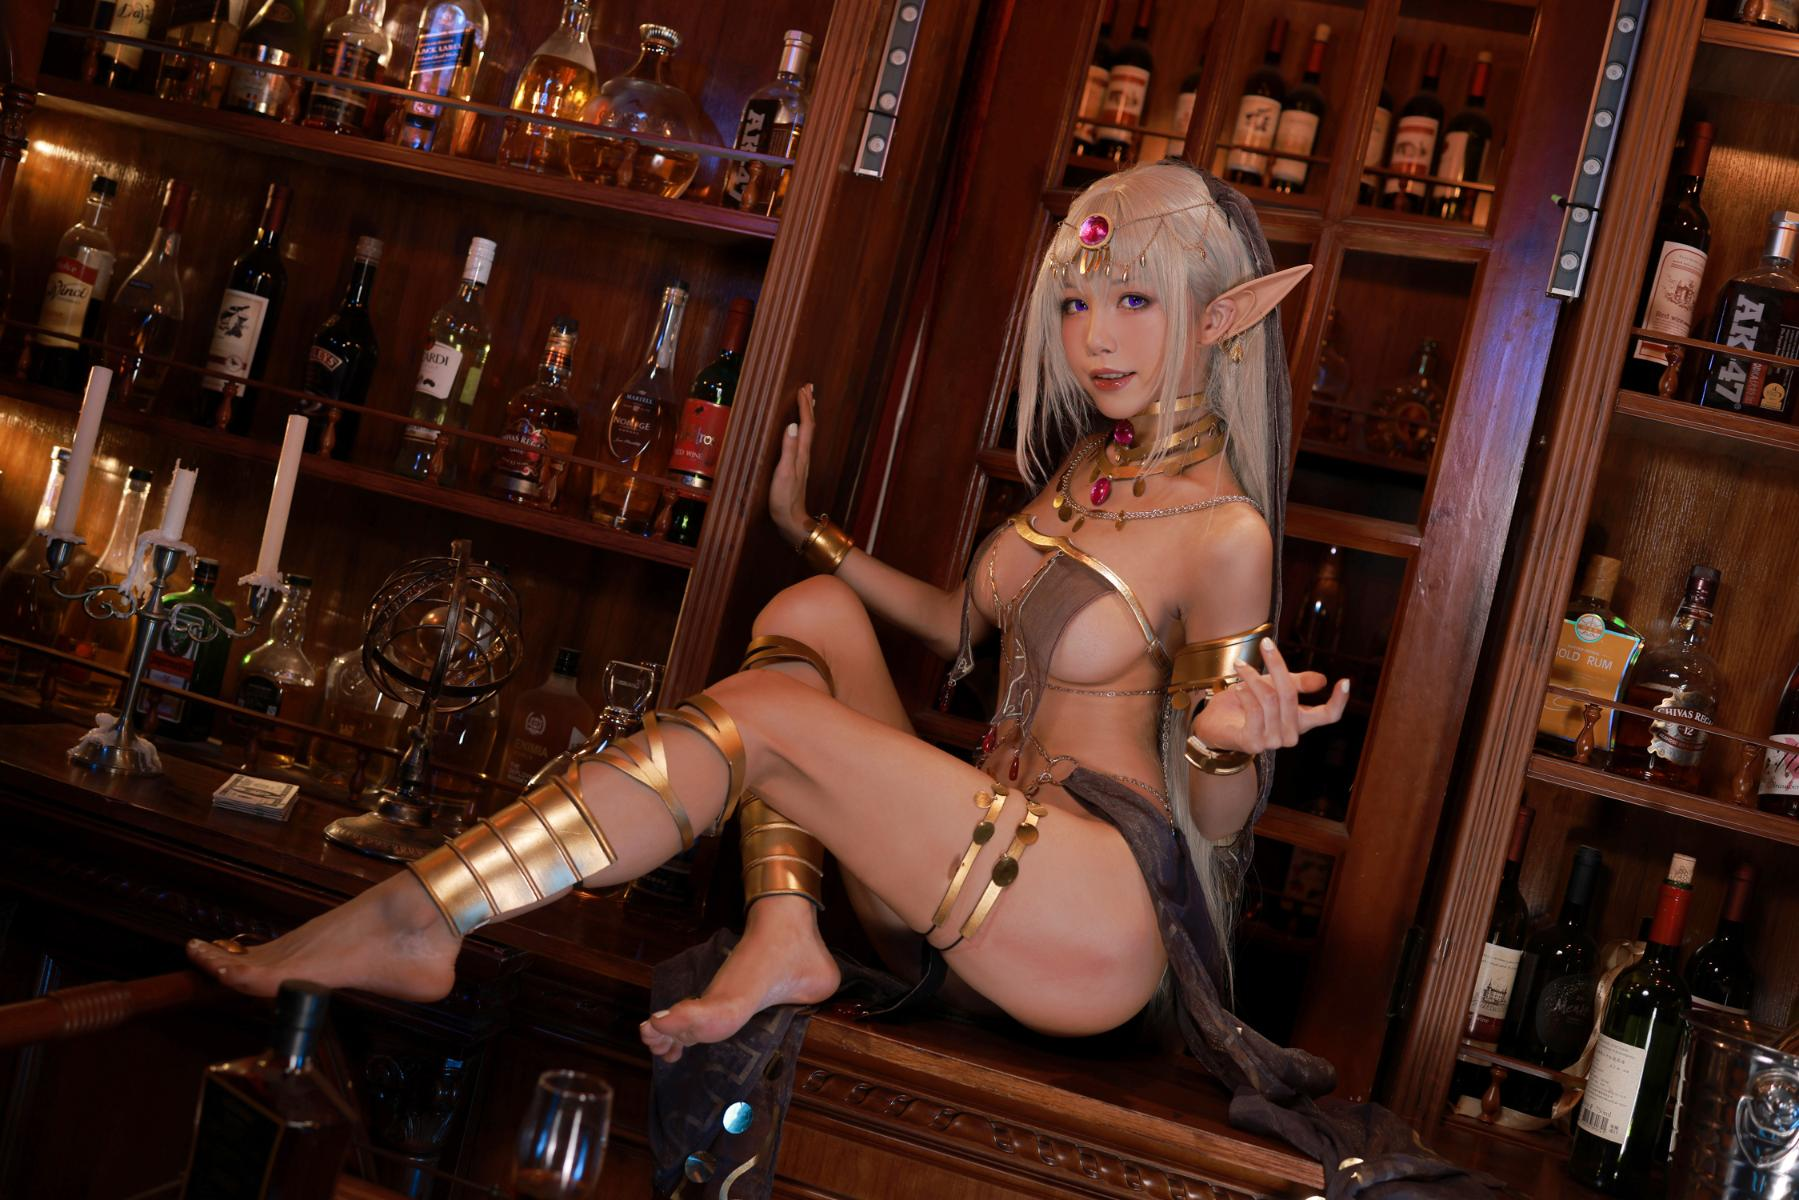 Tan Dancer Elf Succubus Cosplay by Aqua 36